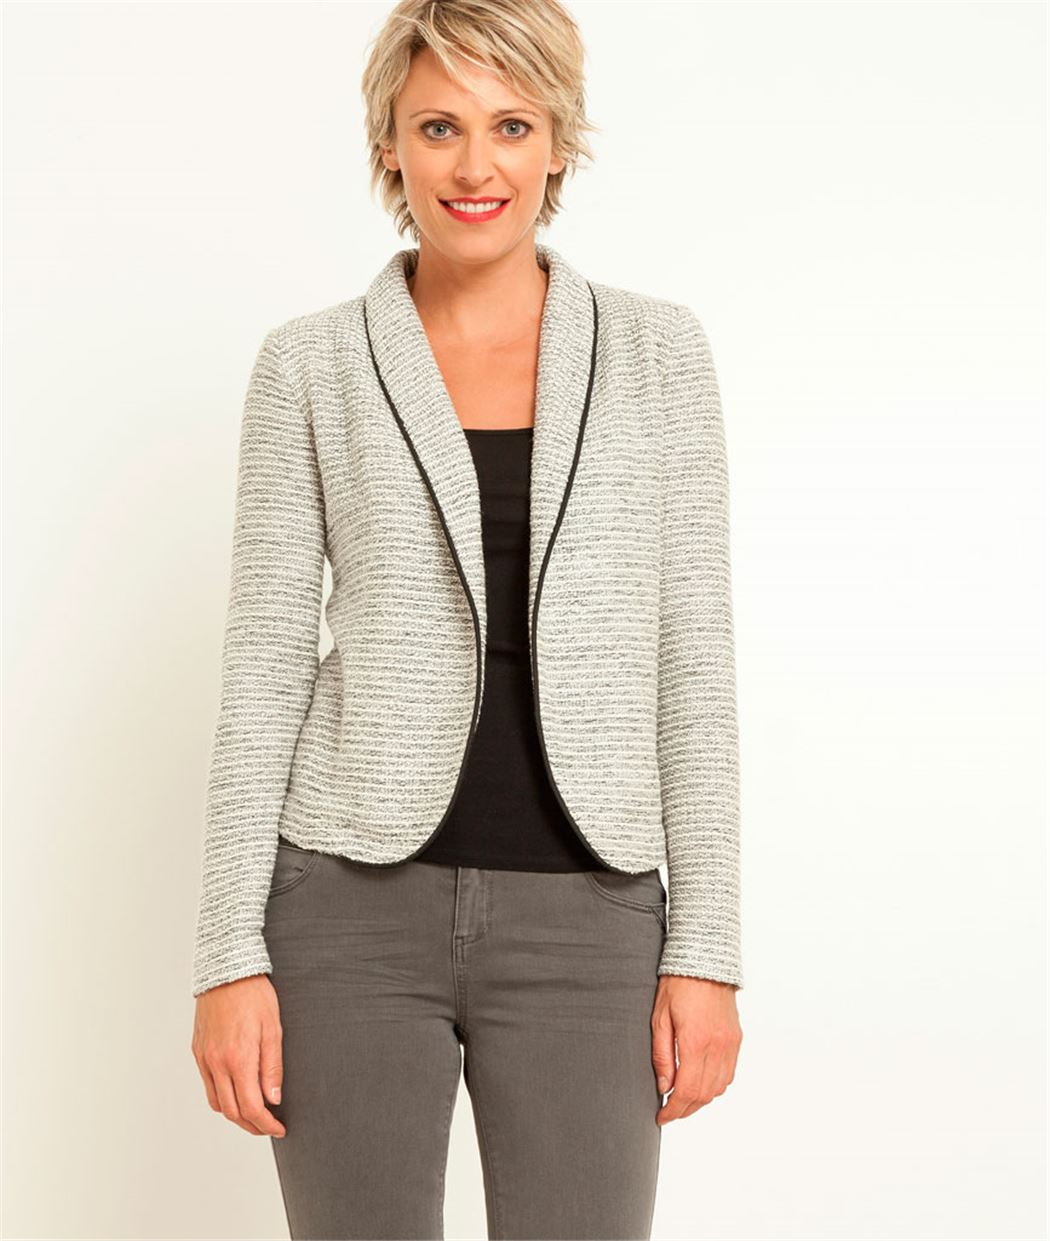 veste femme en maille gris clair grain de malice. Black Bedroom Furniture Sets. Home Design Ideas